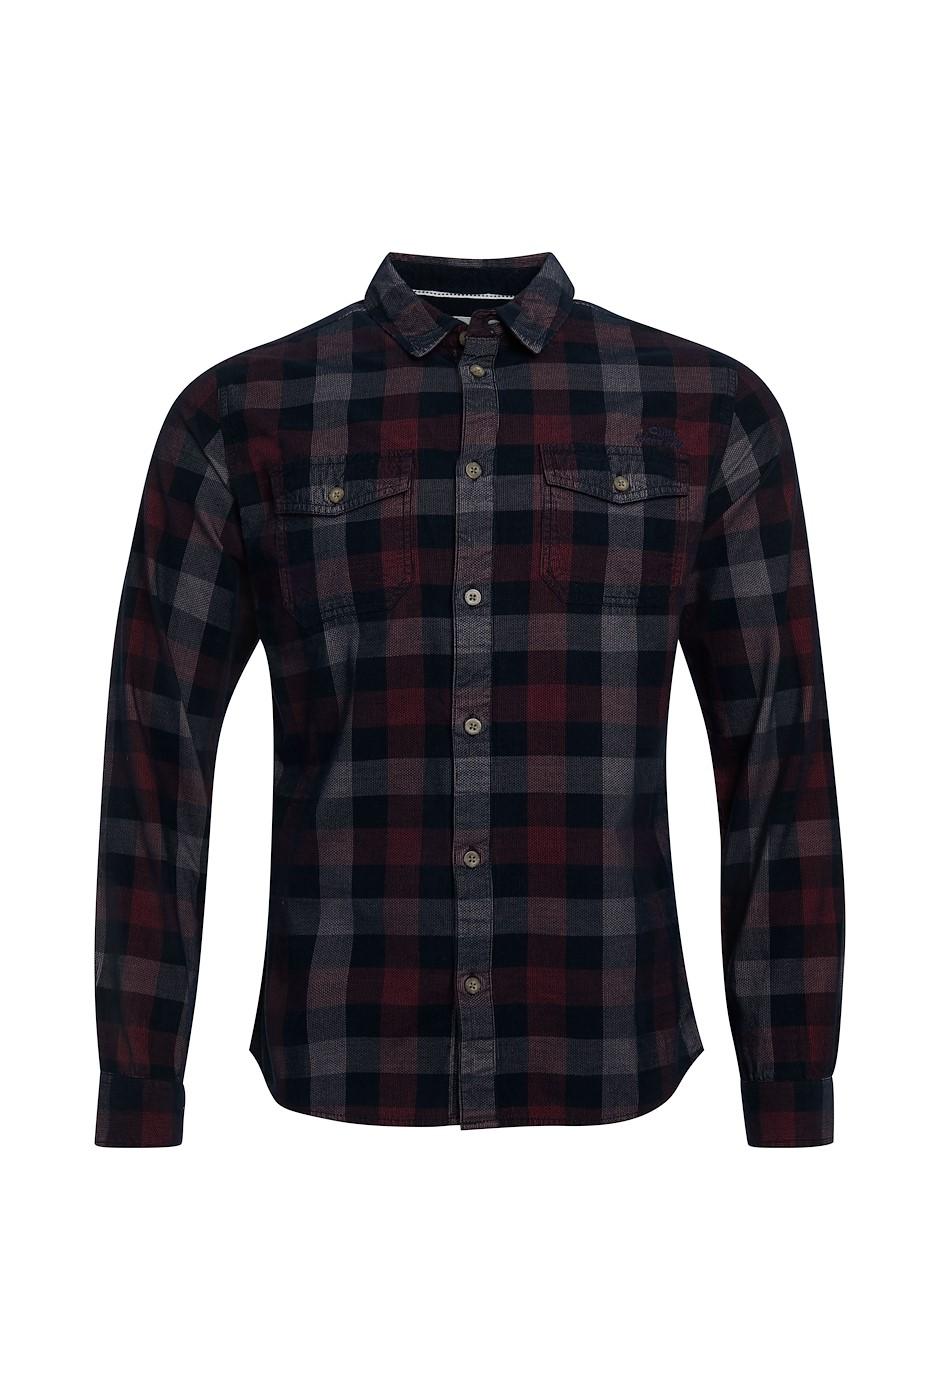 Everman Long Sleeve Cord Check Shirt Navy